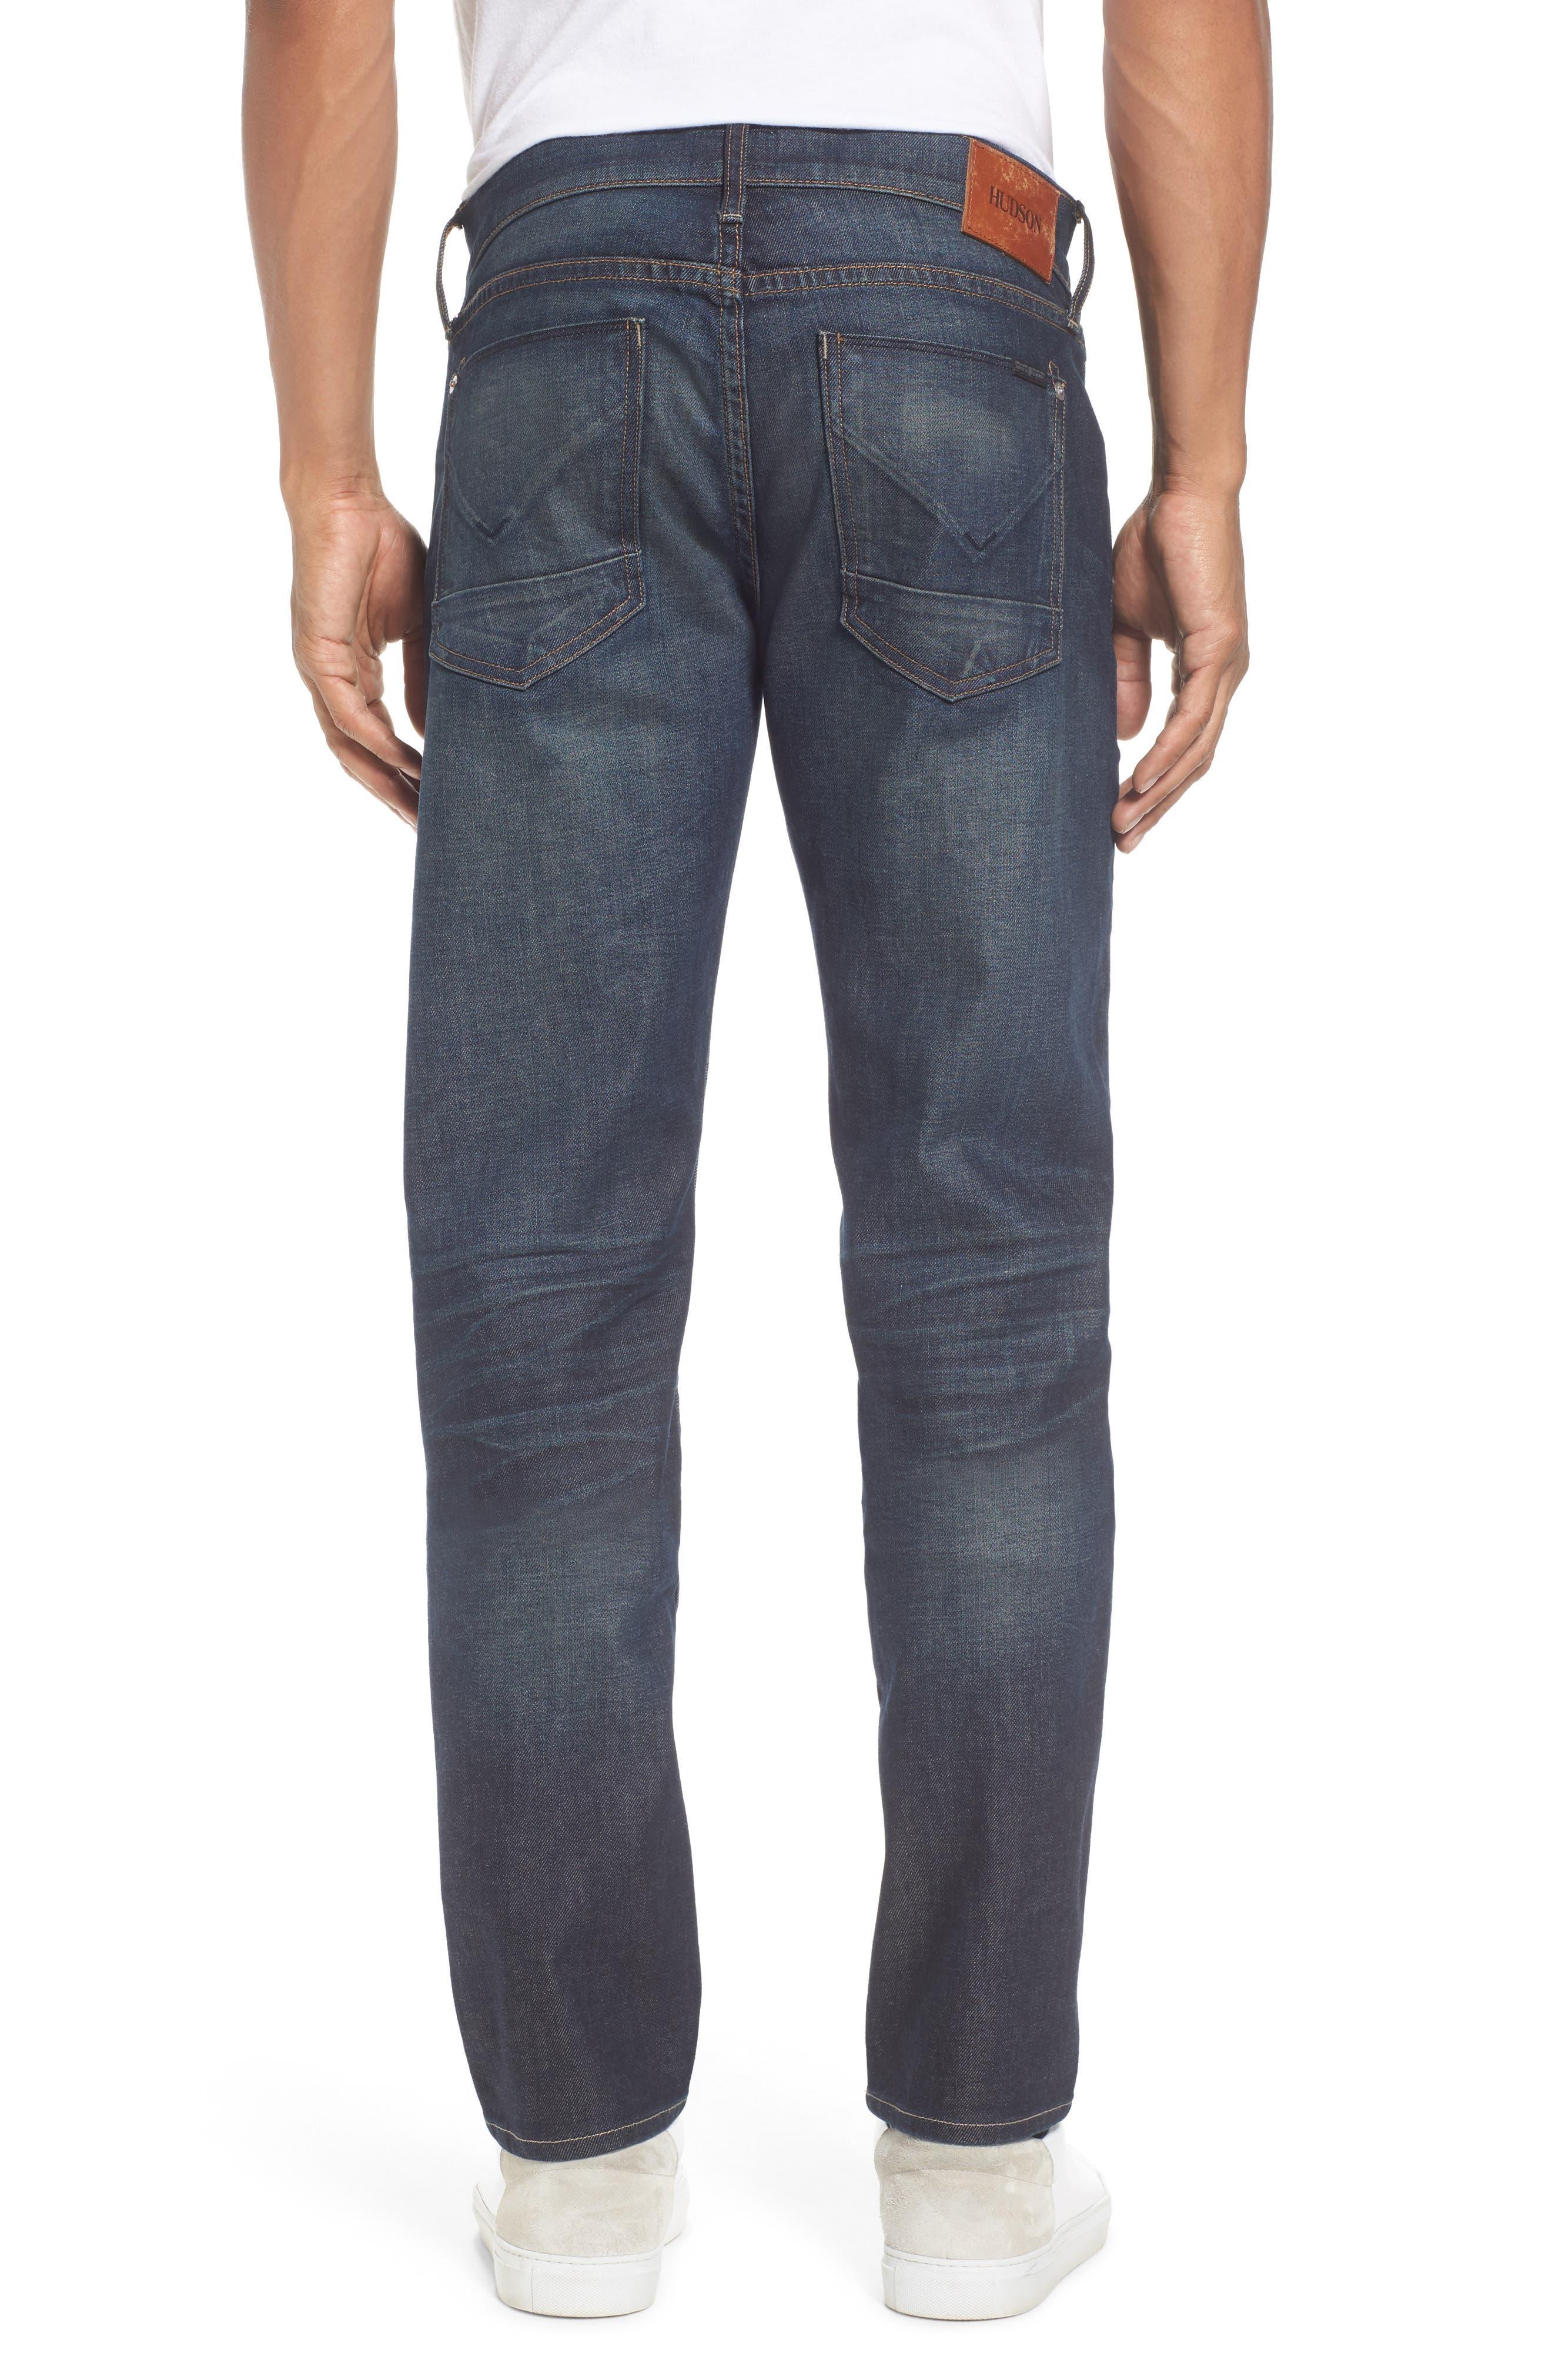 Blake Slim Fit Jeans,                             Alternate thumbnail 2, color,                             420